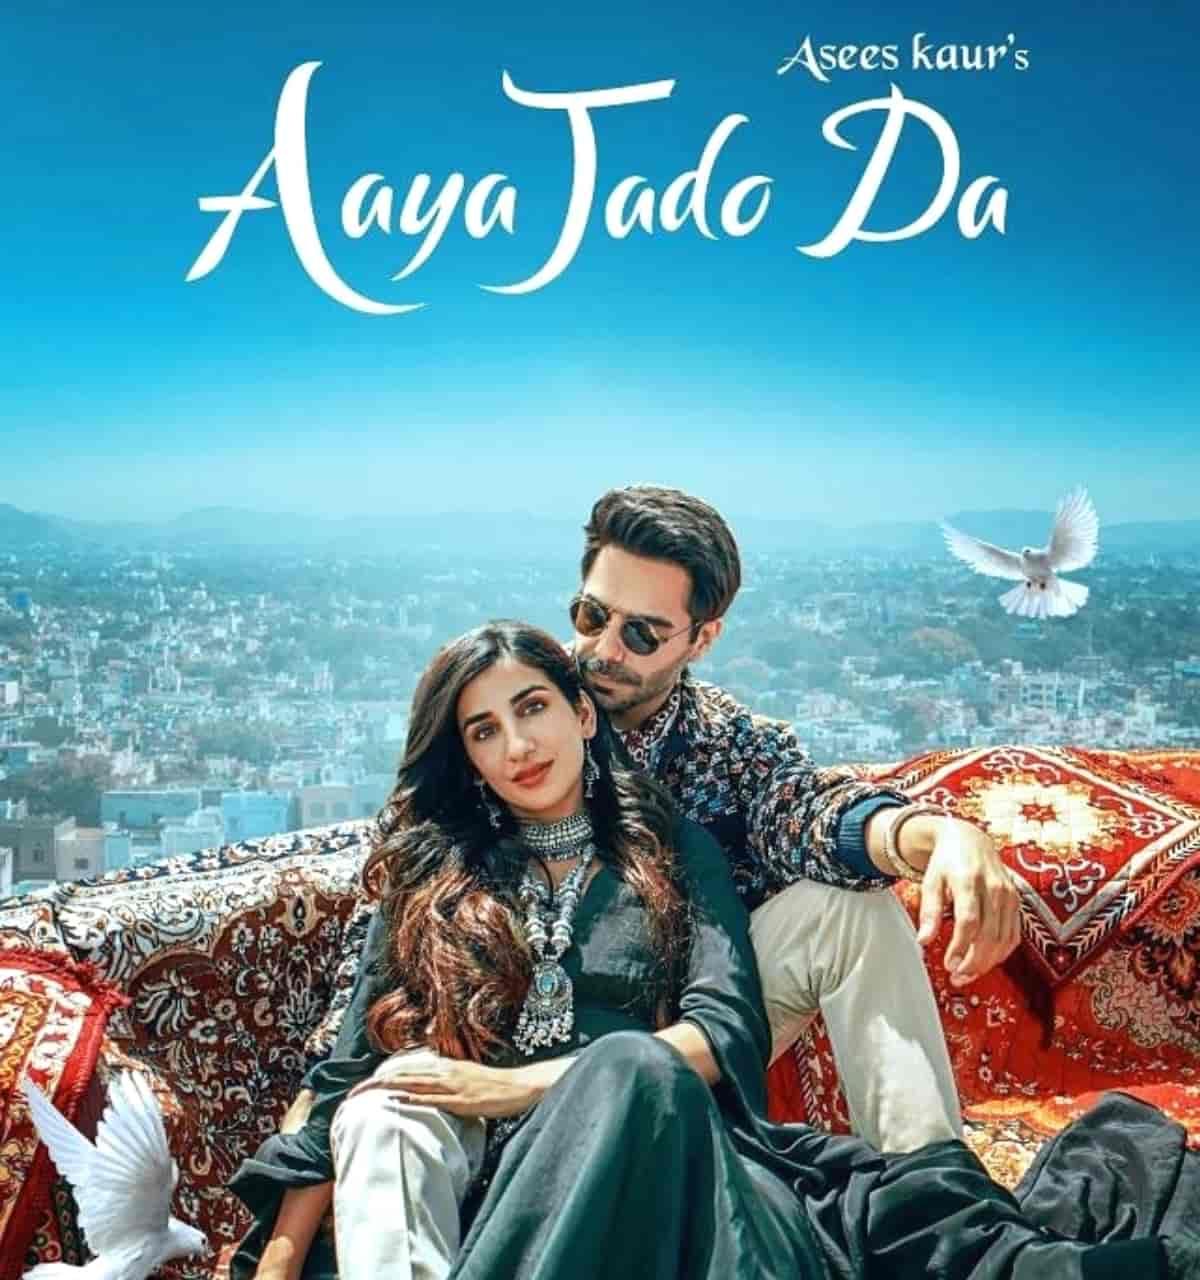 Aaya Jado Da Punjabi Song Lyrics Sung By Asees Kaur